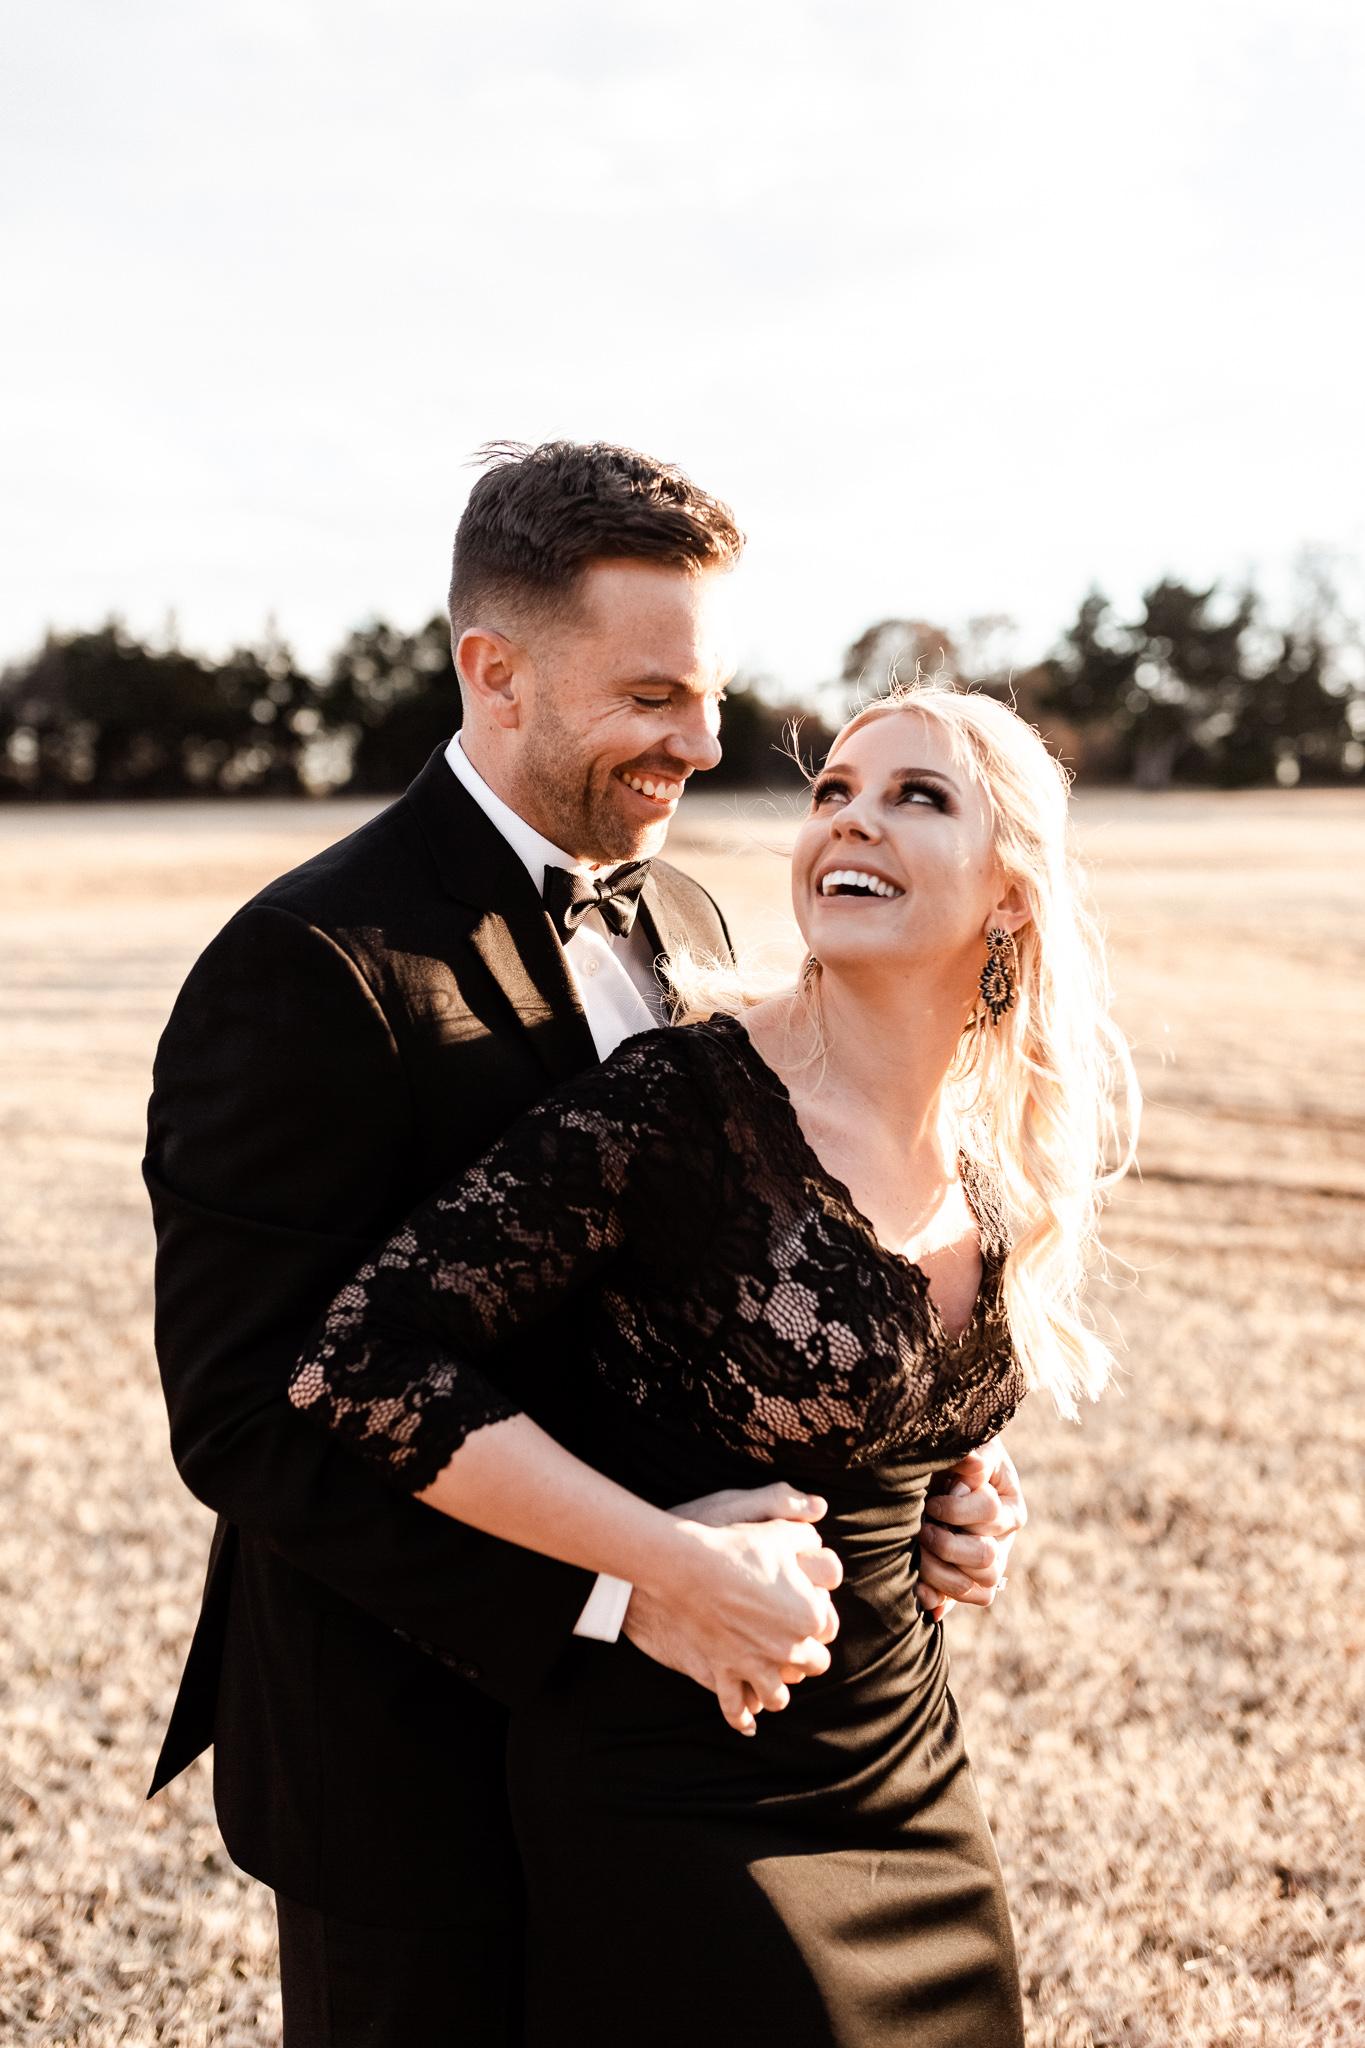 Wade + Stephanie | Warm Open Field Engagements | Oklahoma Wedding Photographer-43.jpg